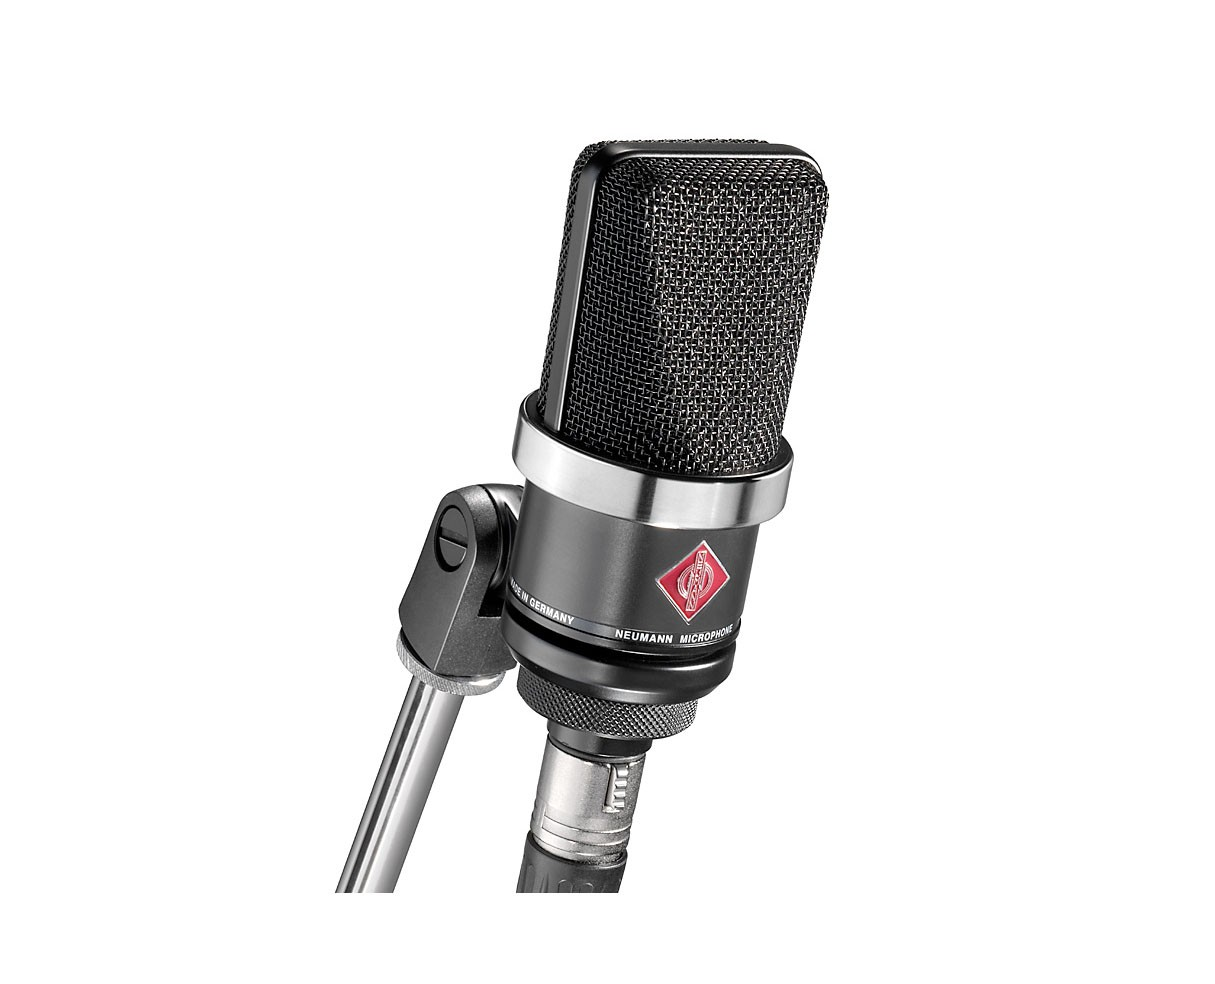 Neumann TLM102 Studio Microphone (Black)